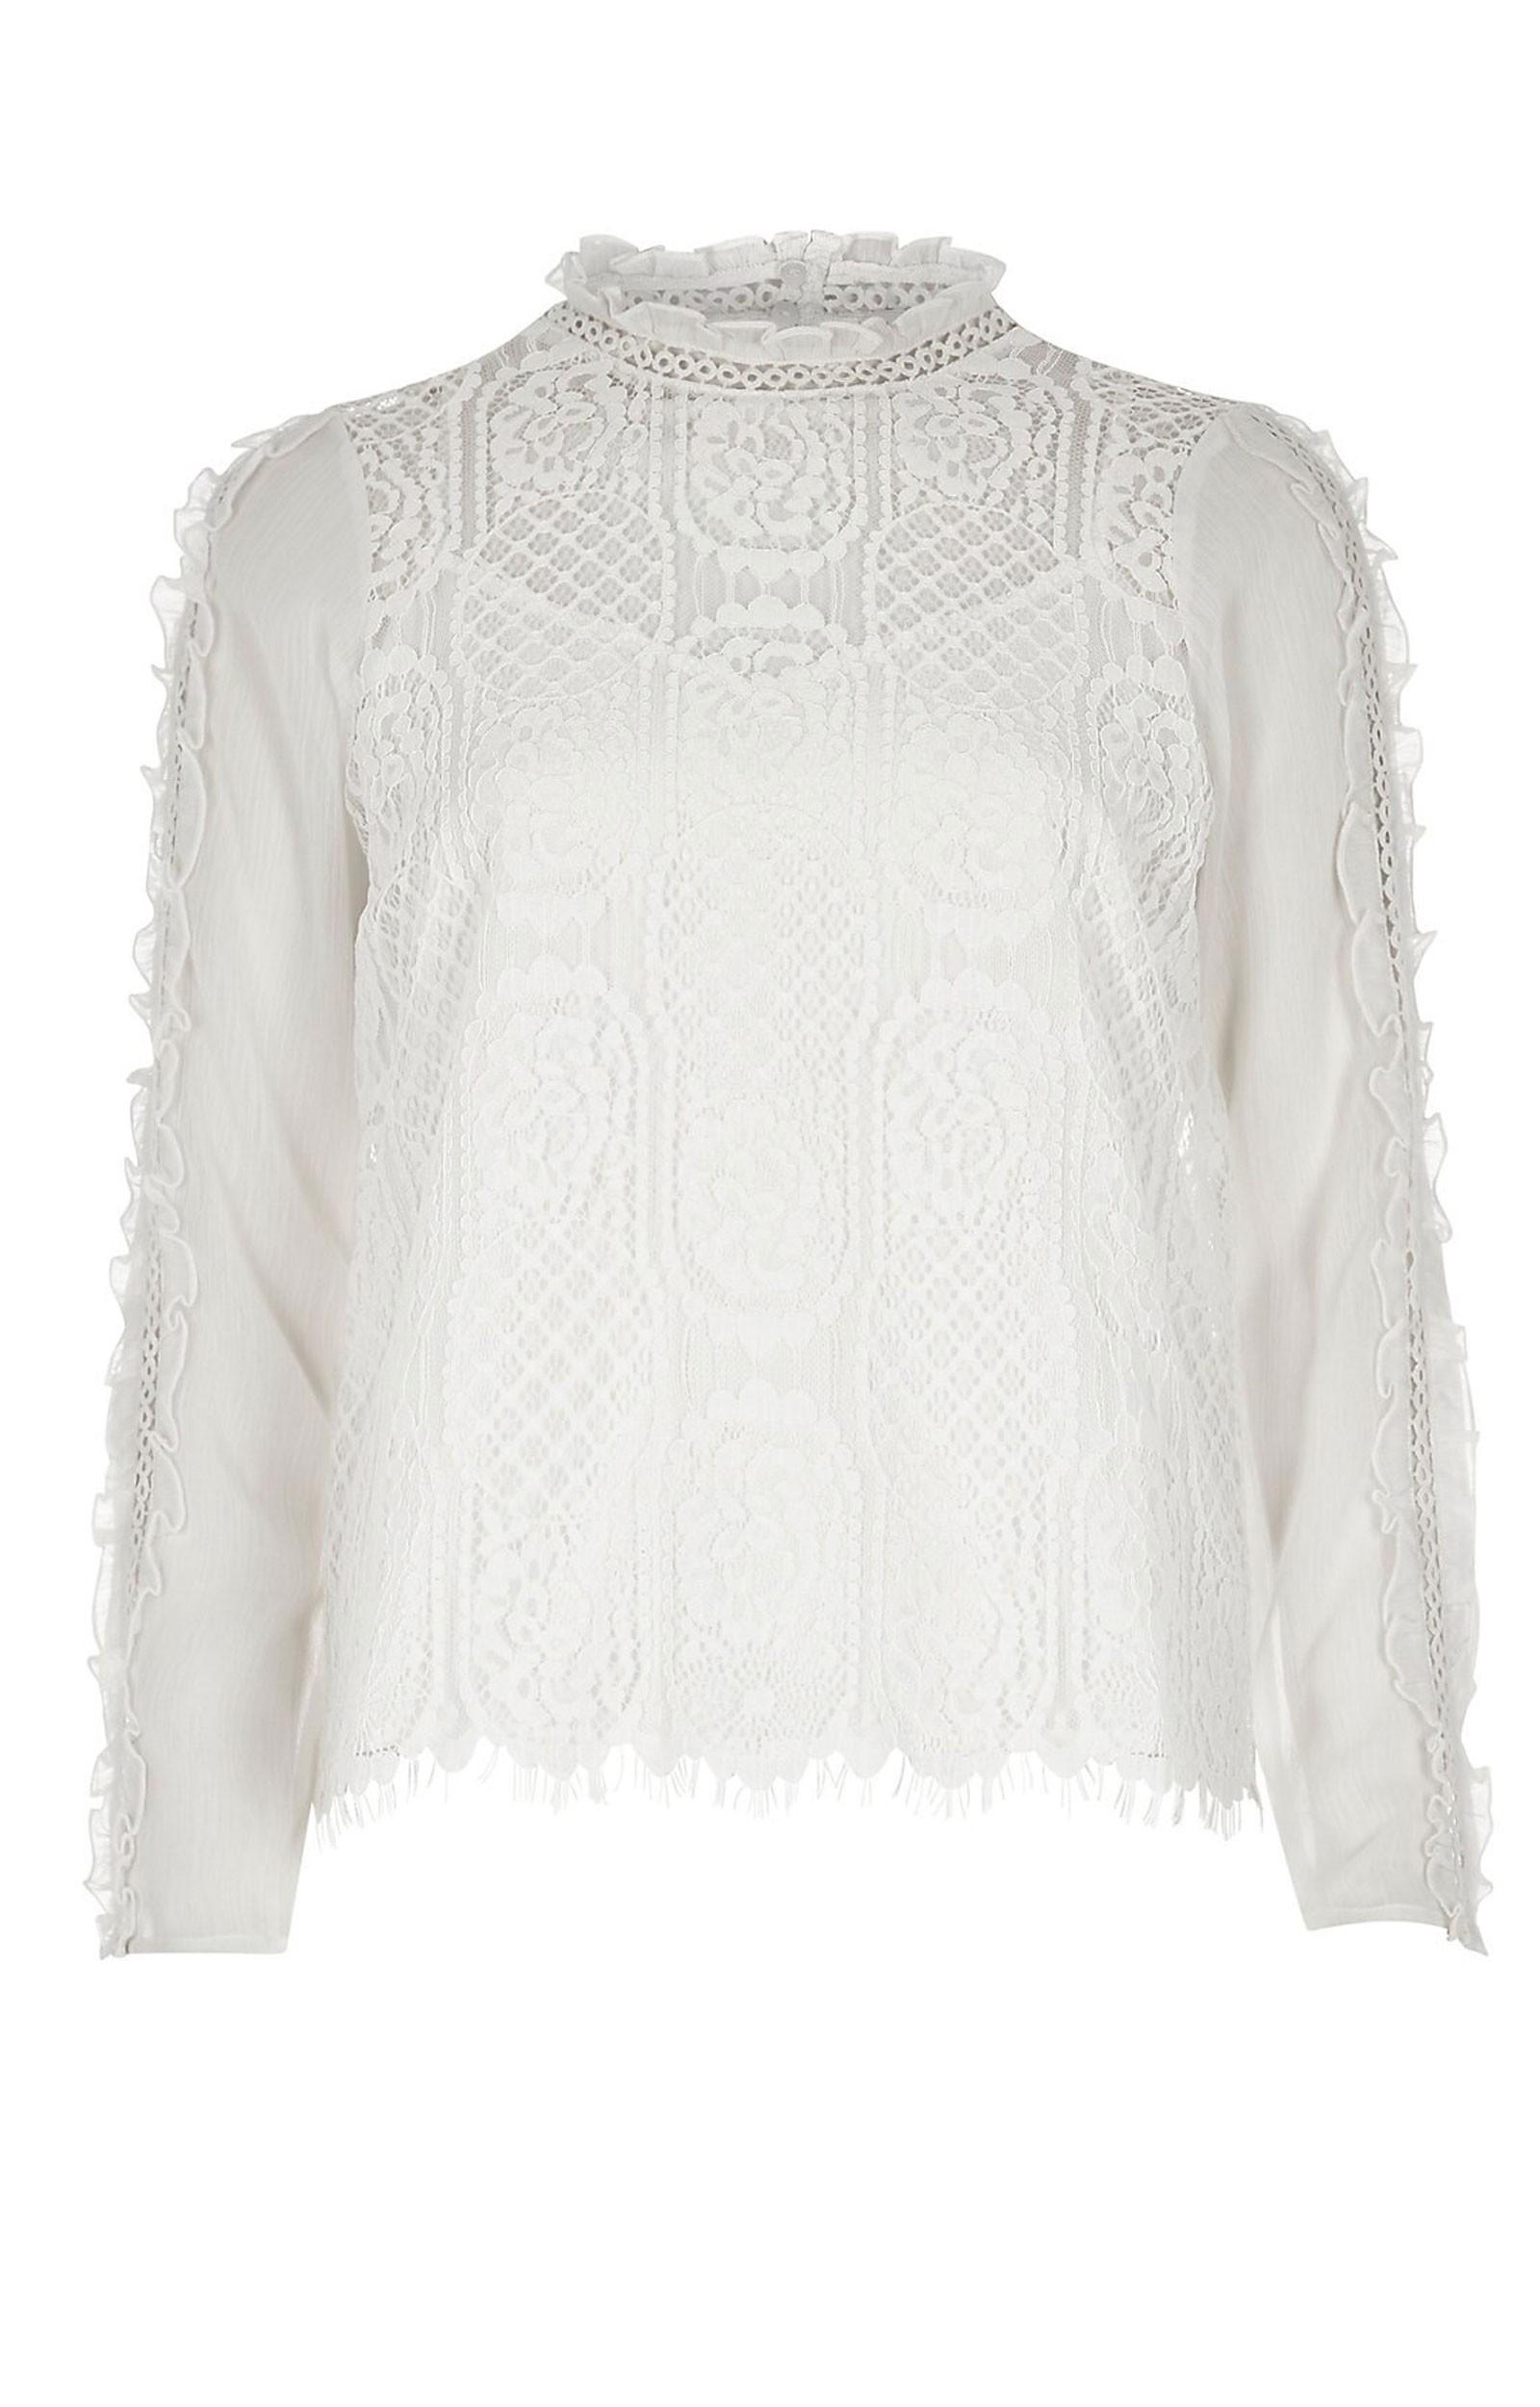 8cfebfafe42aa7 Wholesale Tiver Island White Lace Top